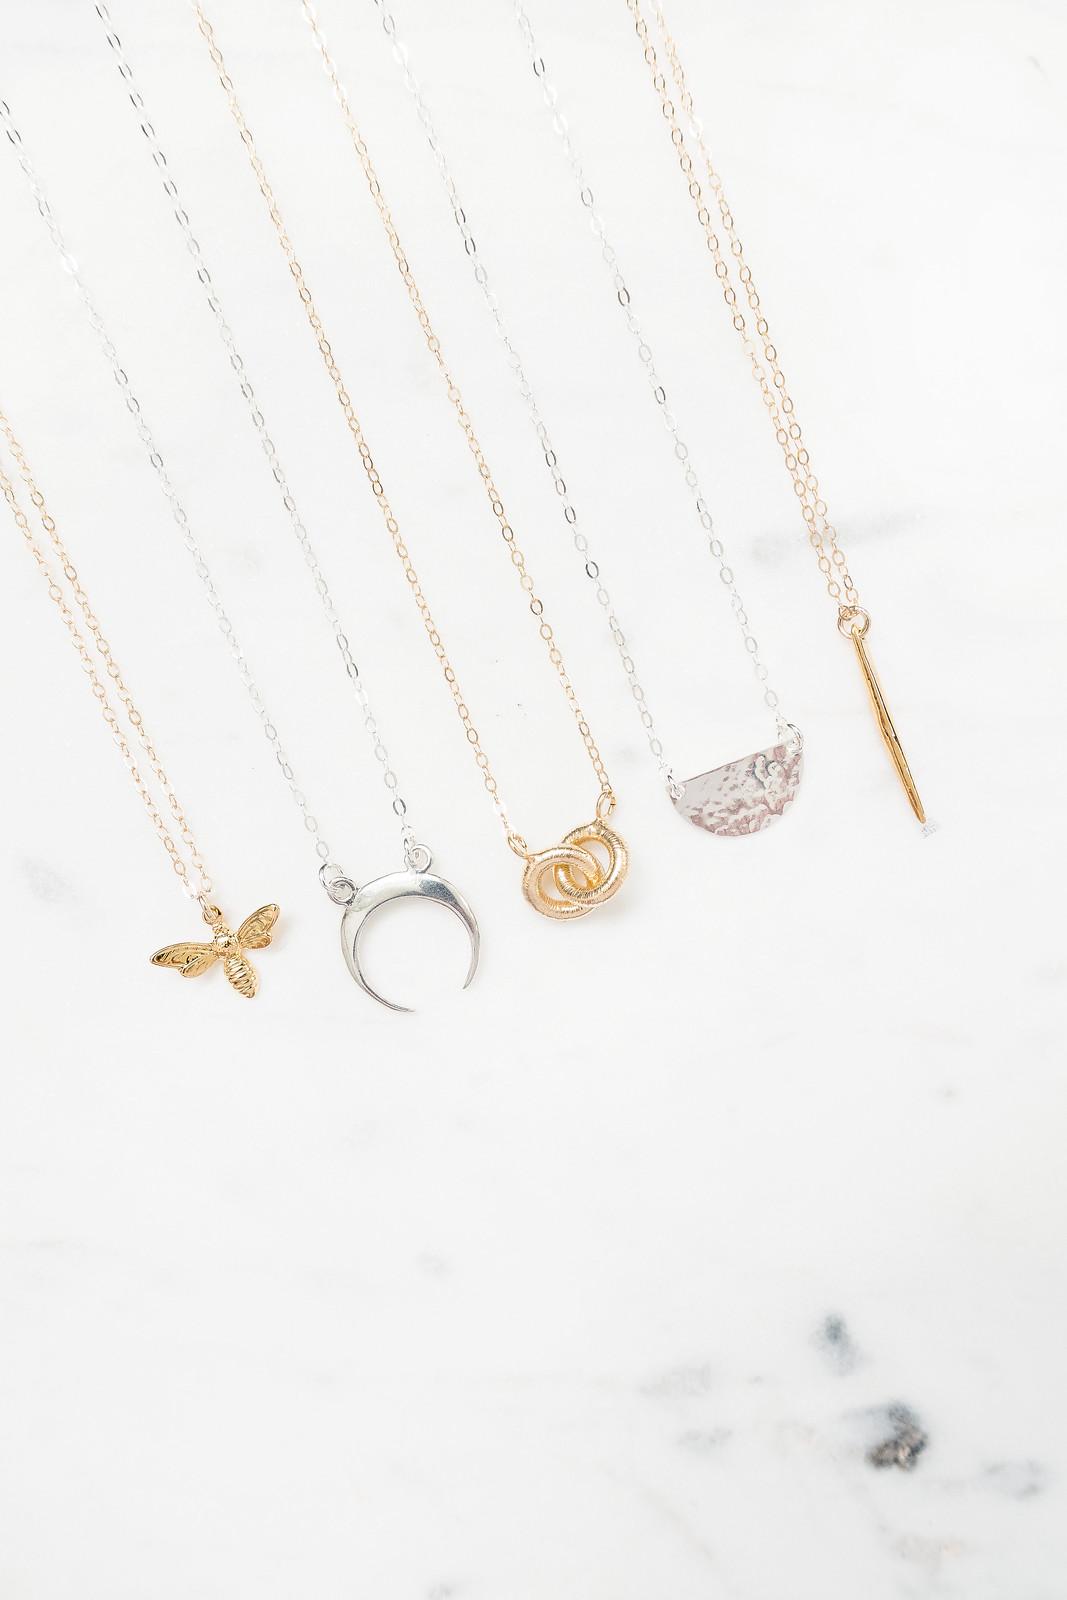 Restocked Minimal Jewellery UK